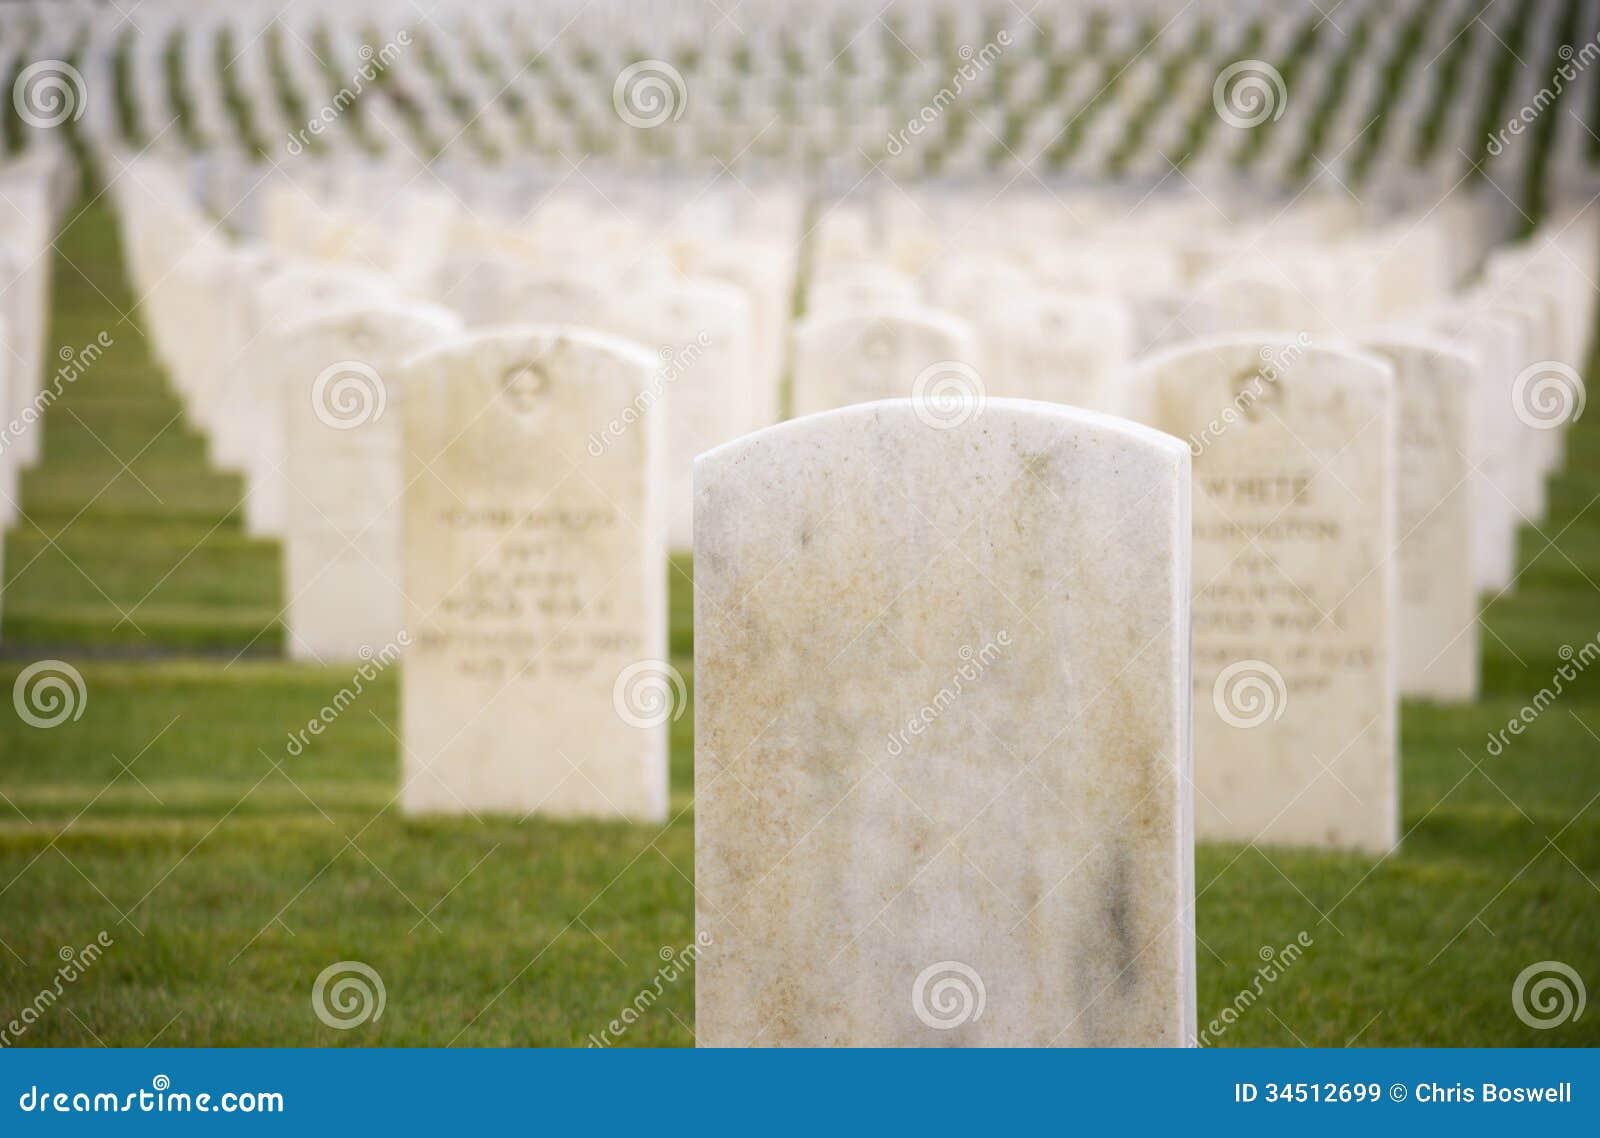 Marble Stone Military Headstones Hundreds Row Graveyard